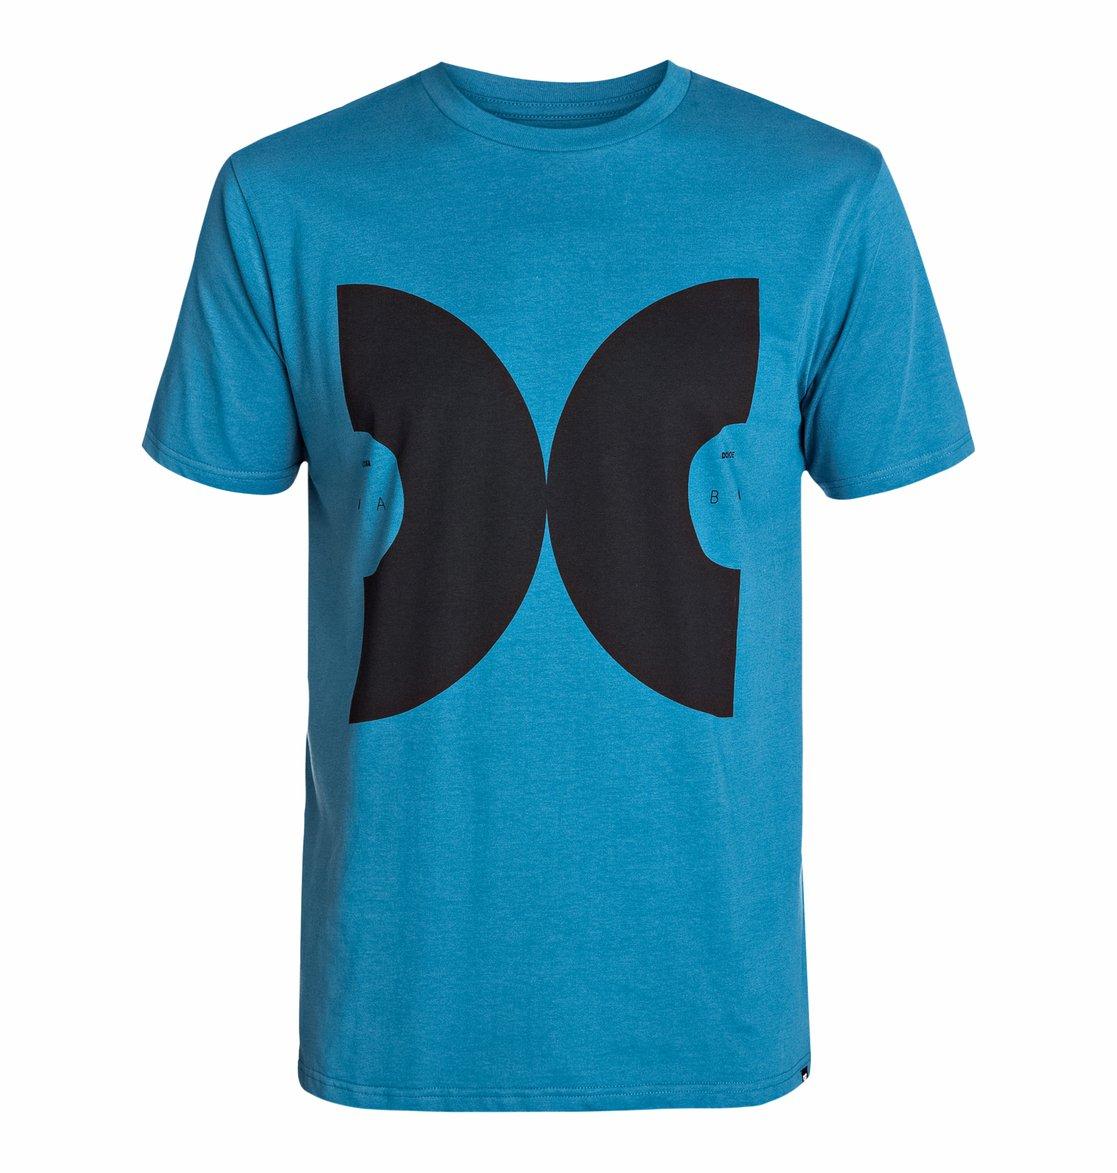 Vinyl Short Sleeve - Dcshoes������� �������� � ����������� ������� Vinyl SS �� DC Shoes � ������� �� ��������� ����� 2015. ��������������: ����������� ����, ������� ���������� ��������� ������� Softhand Ink.<br>